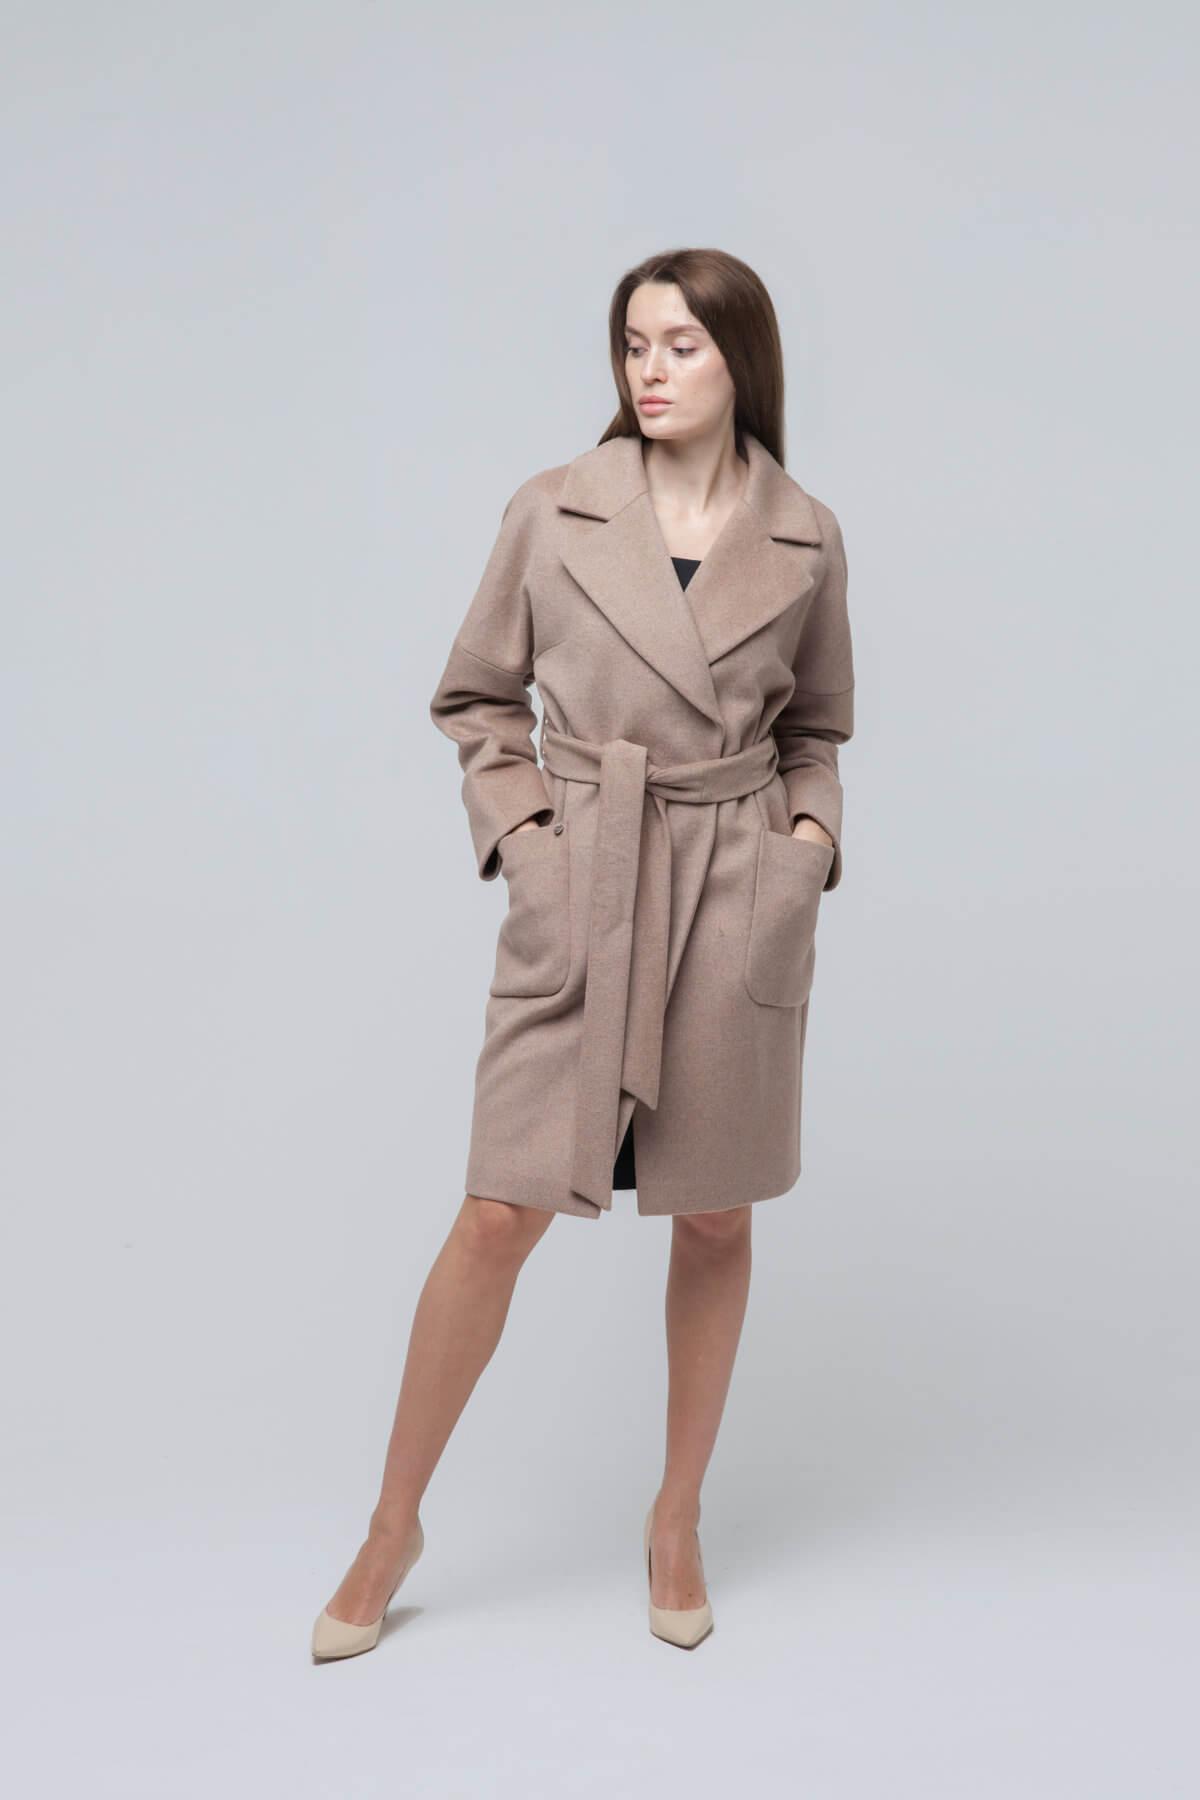 Пальто из текстиля. Фото 1